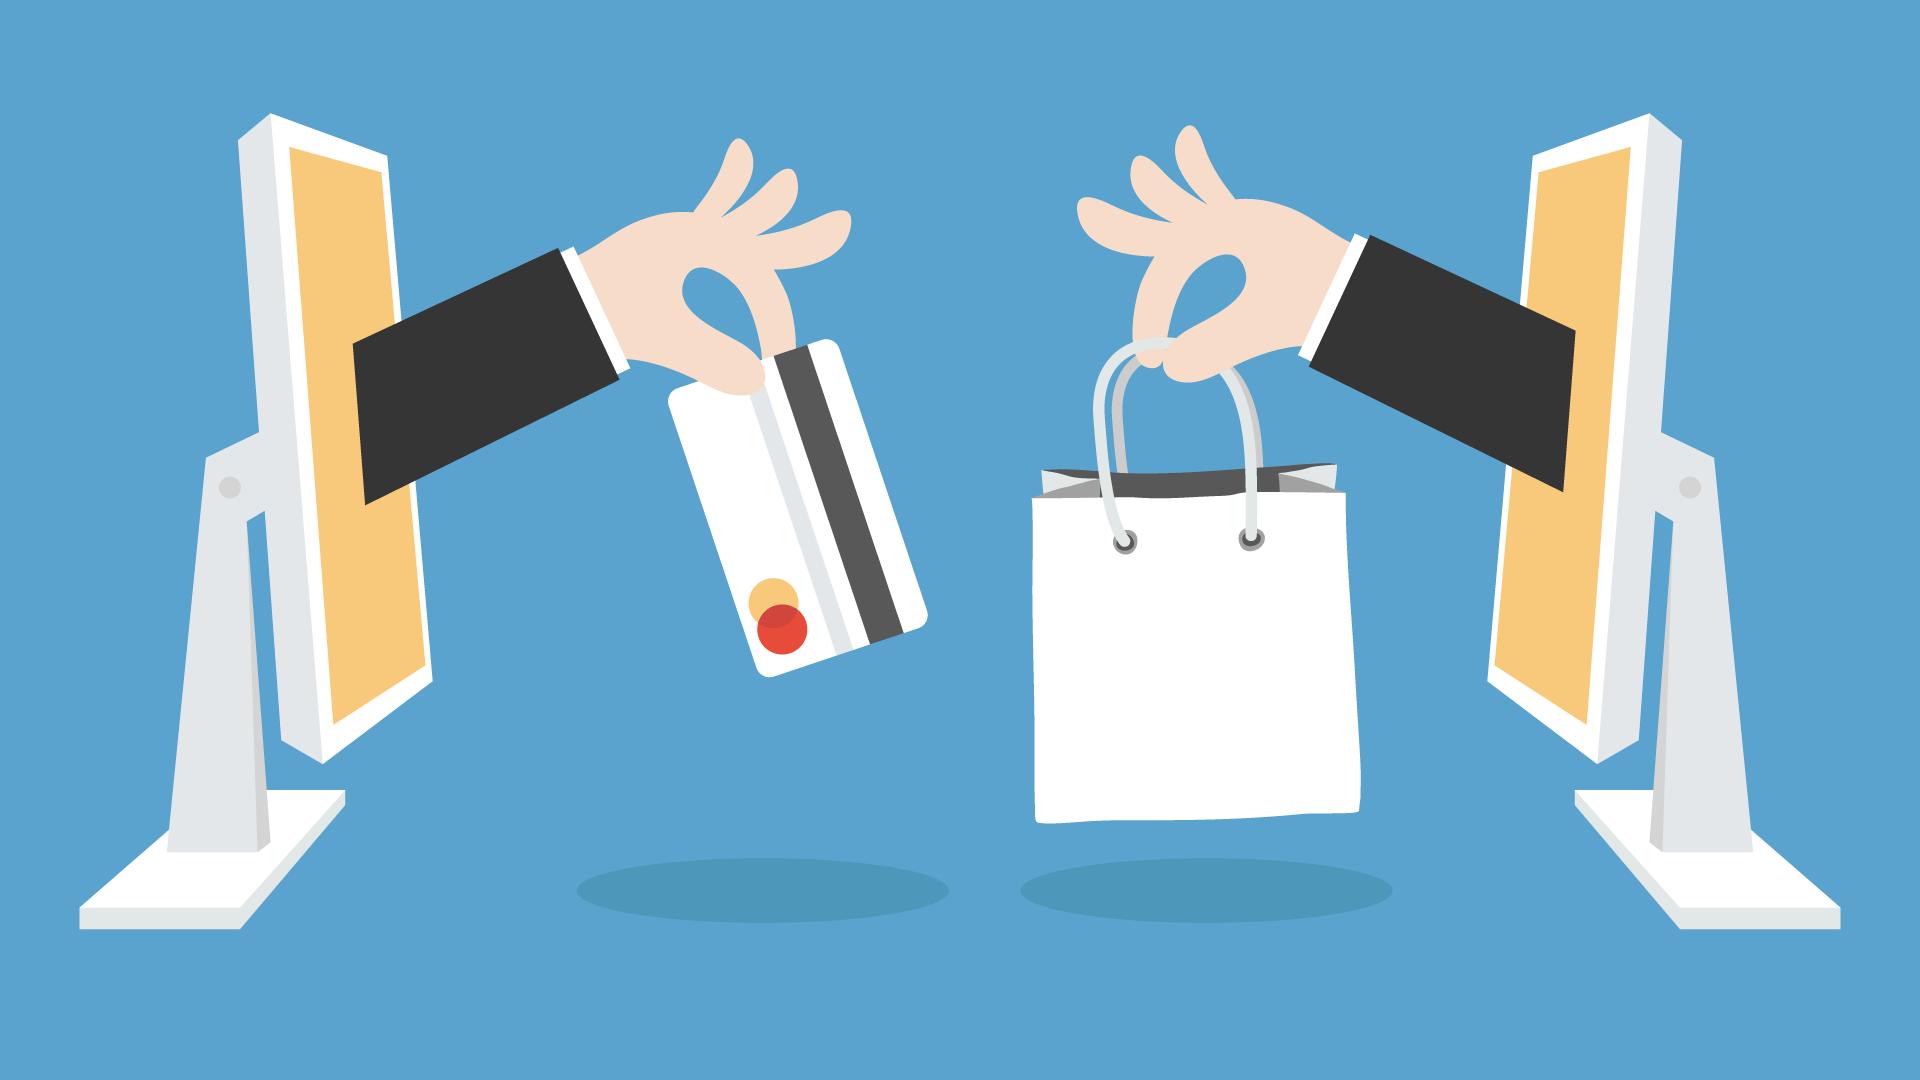 сотрудничество, коммуникация, продажи через интернет